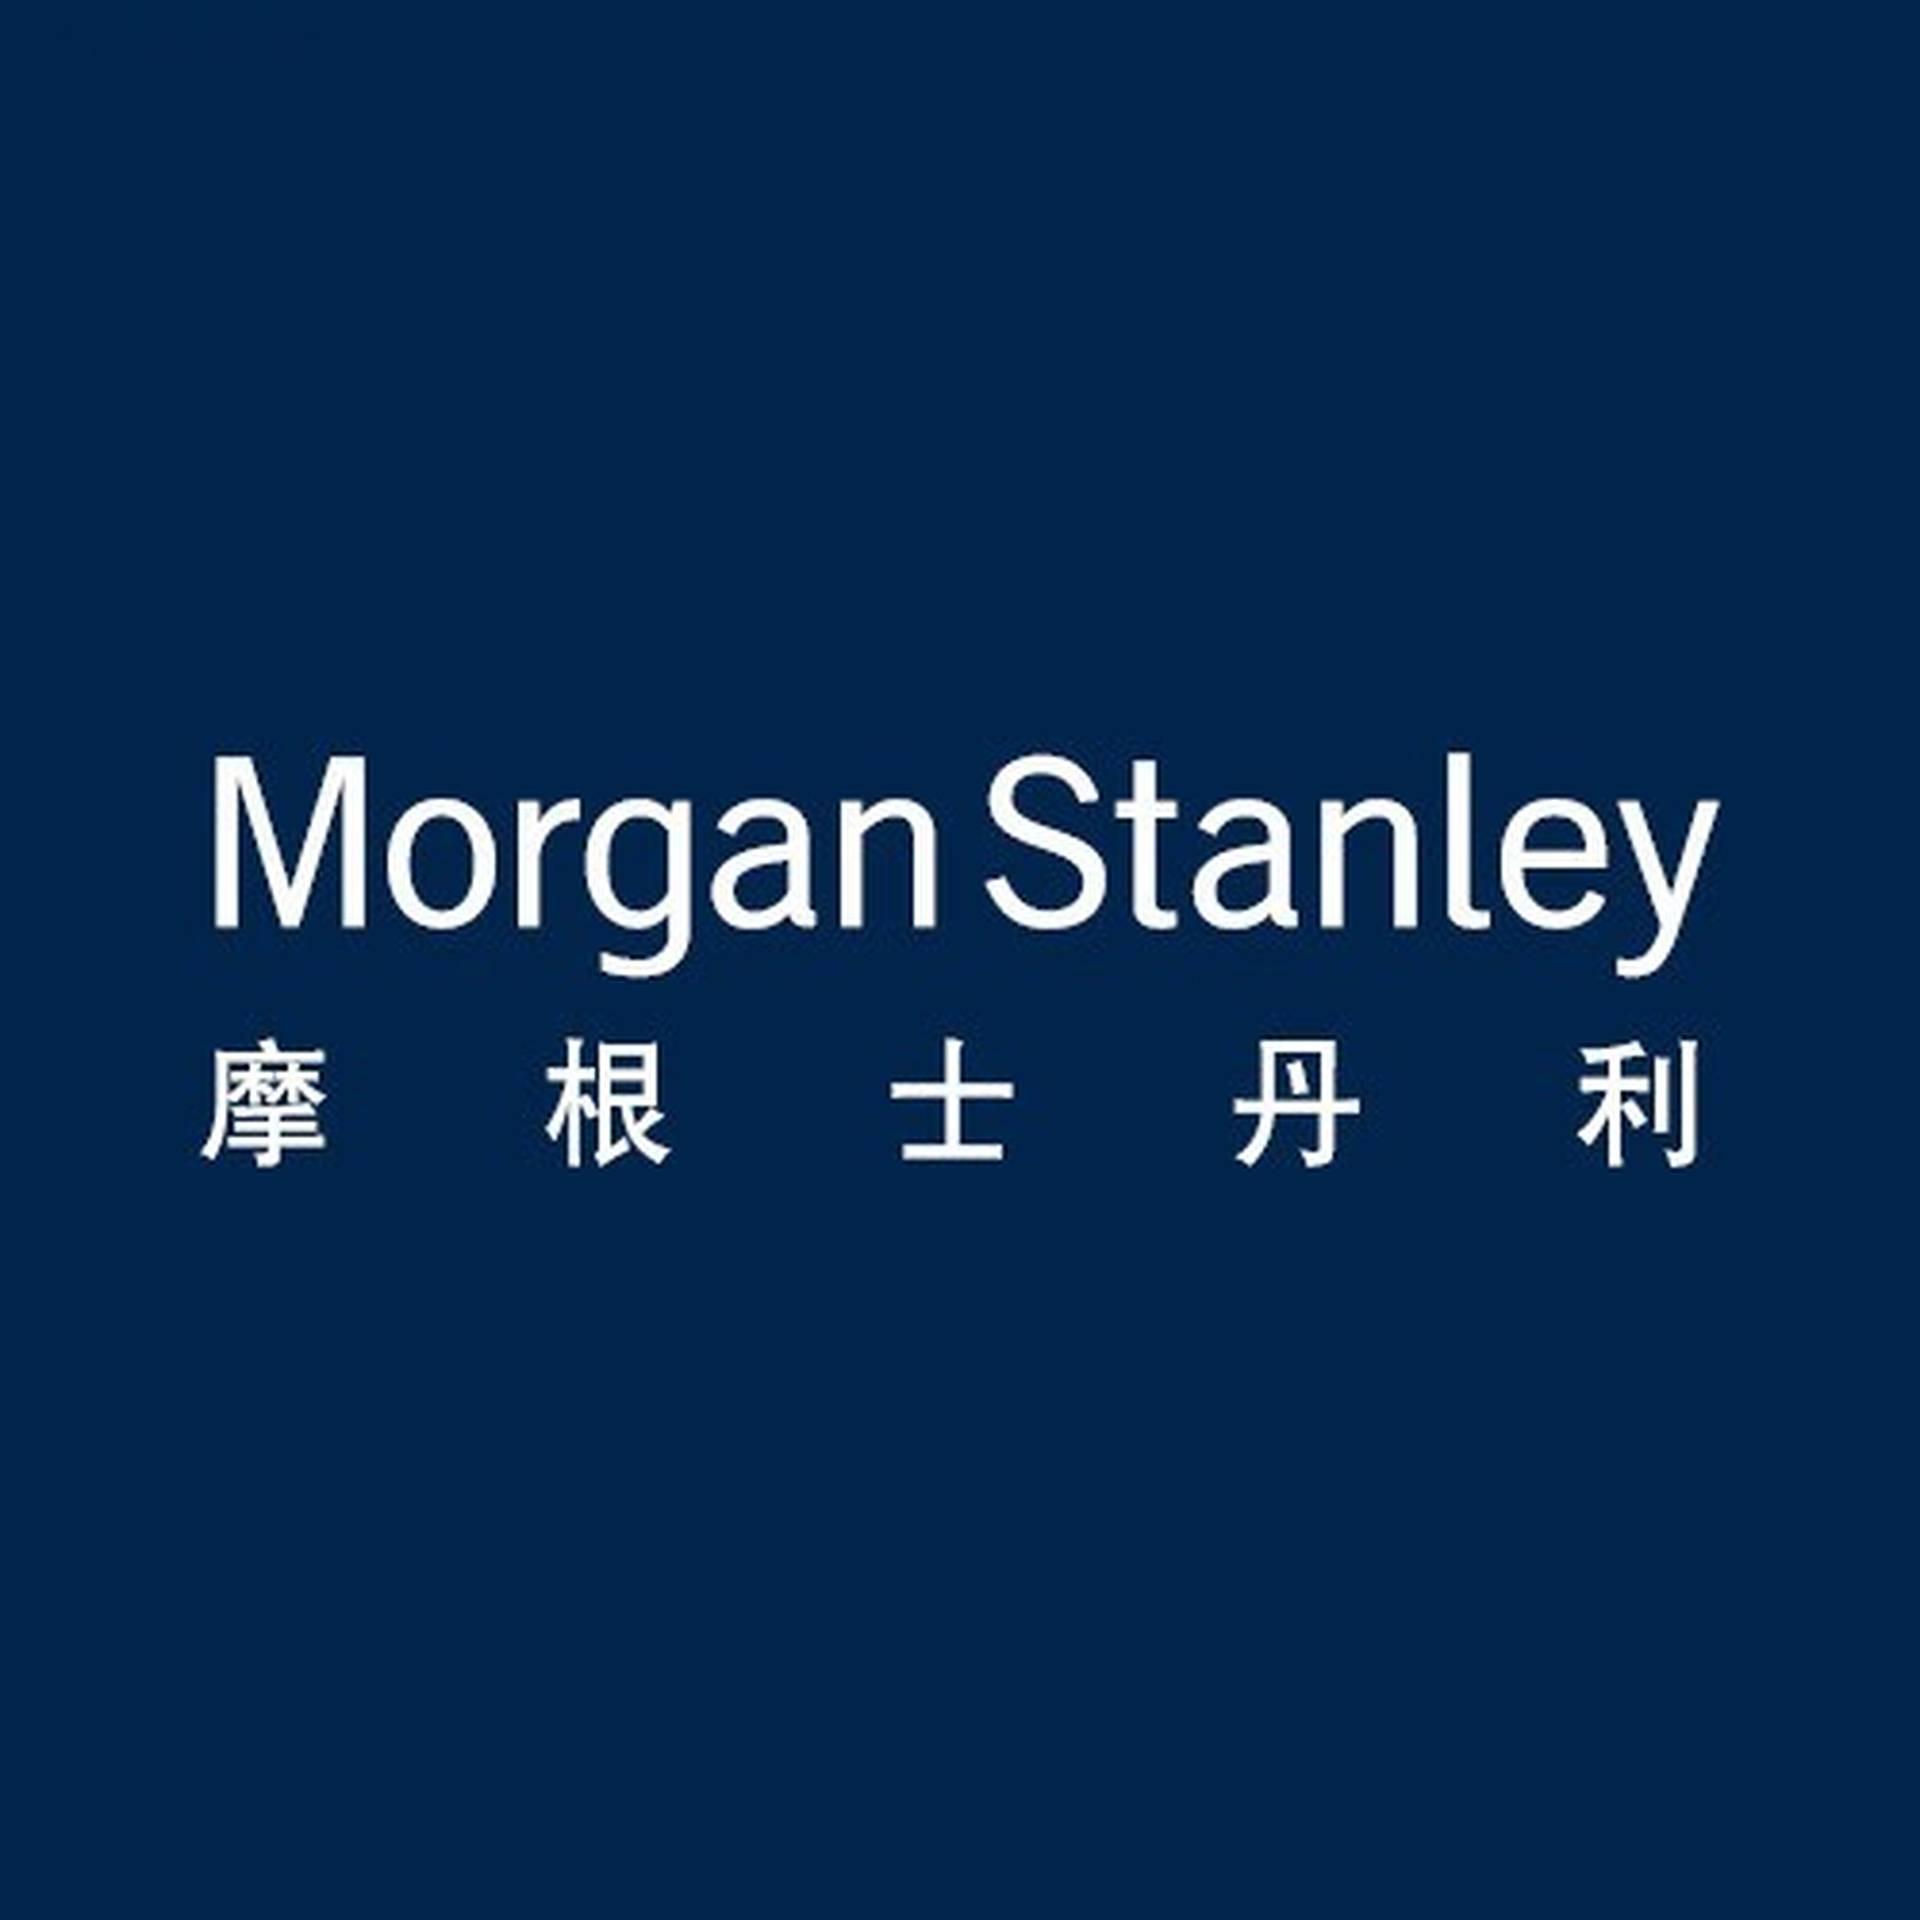 摩根士丹利 Morgan Stanley